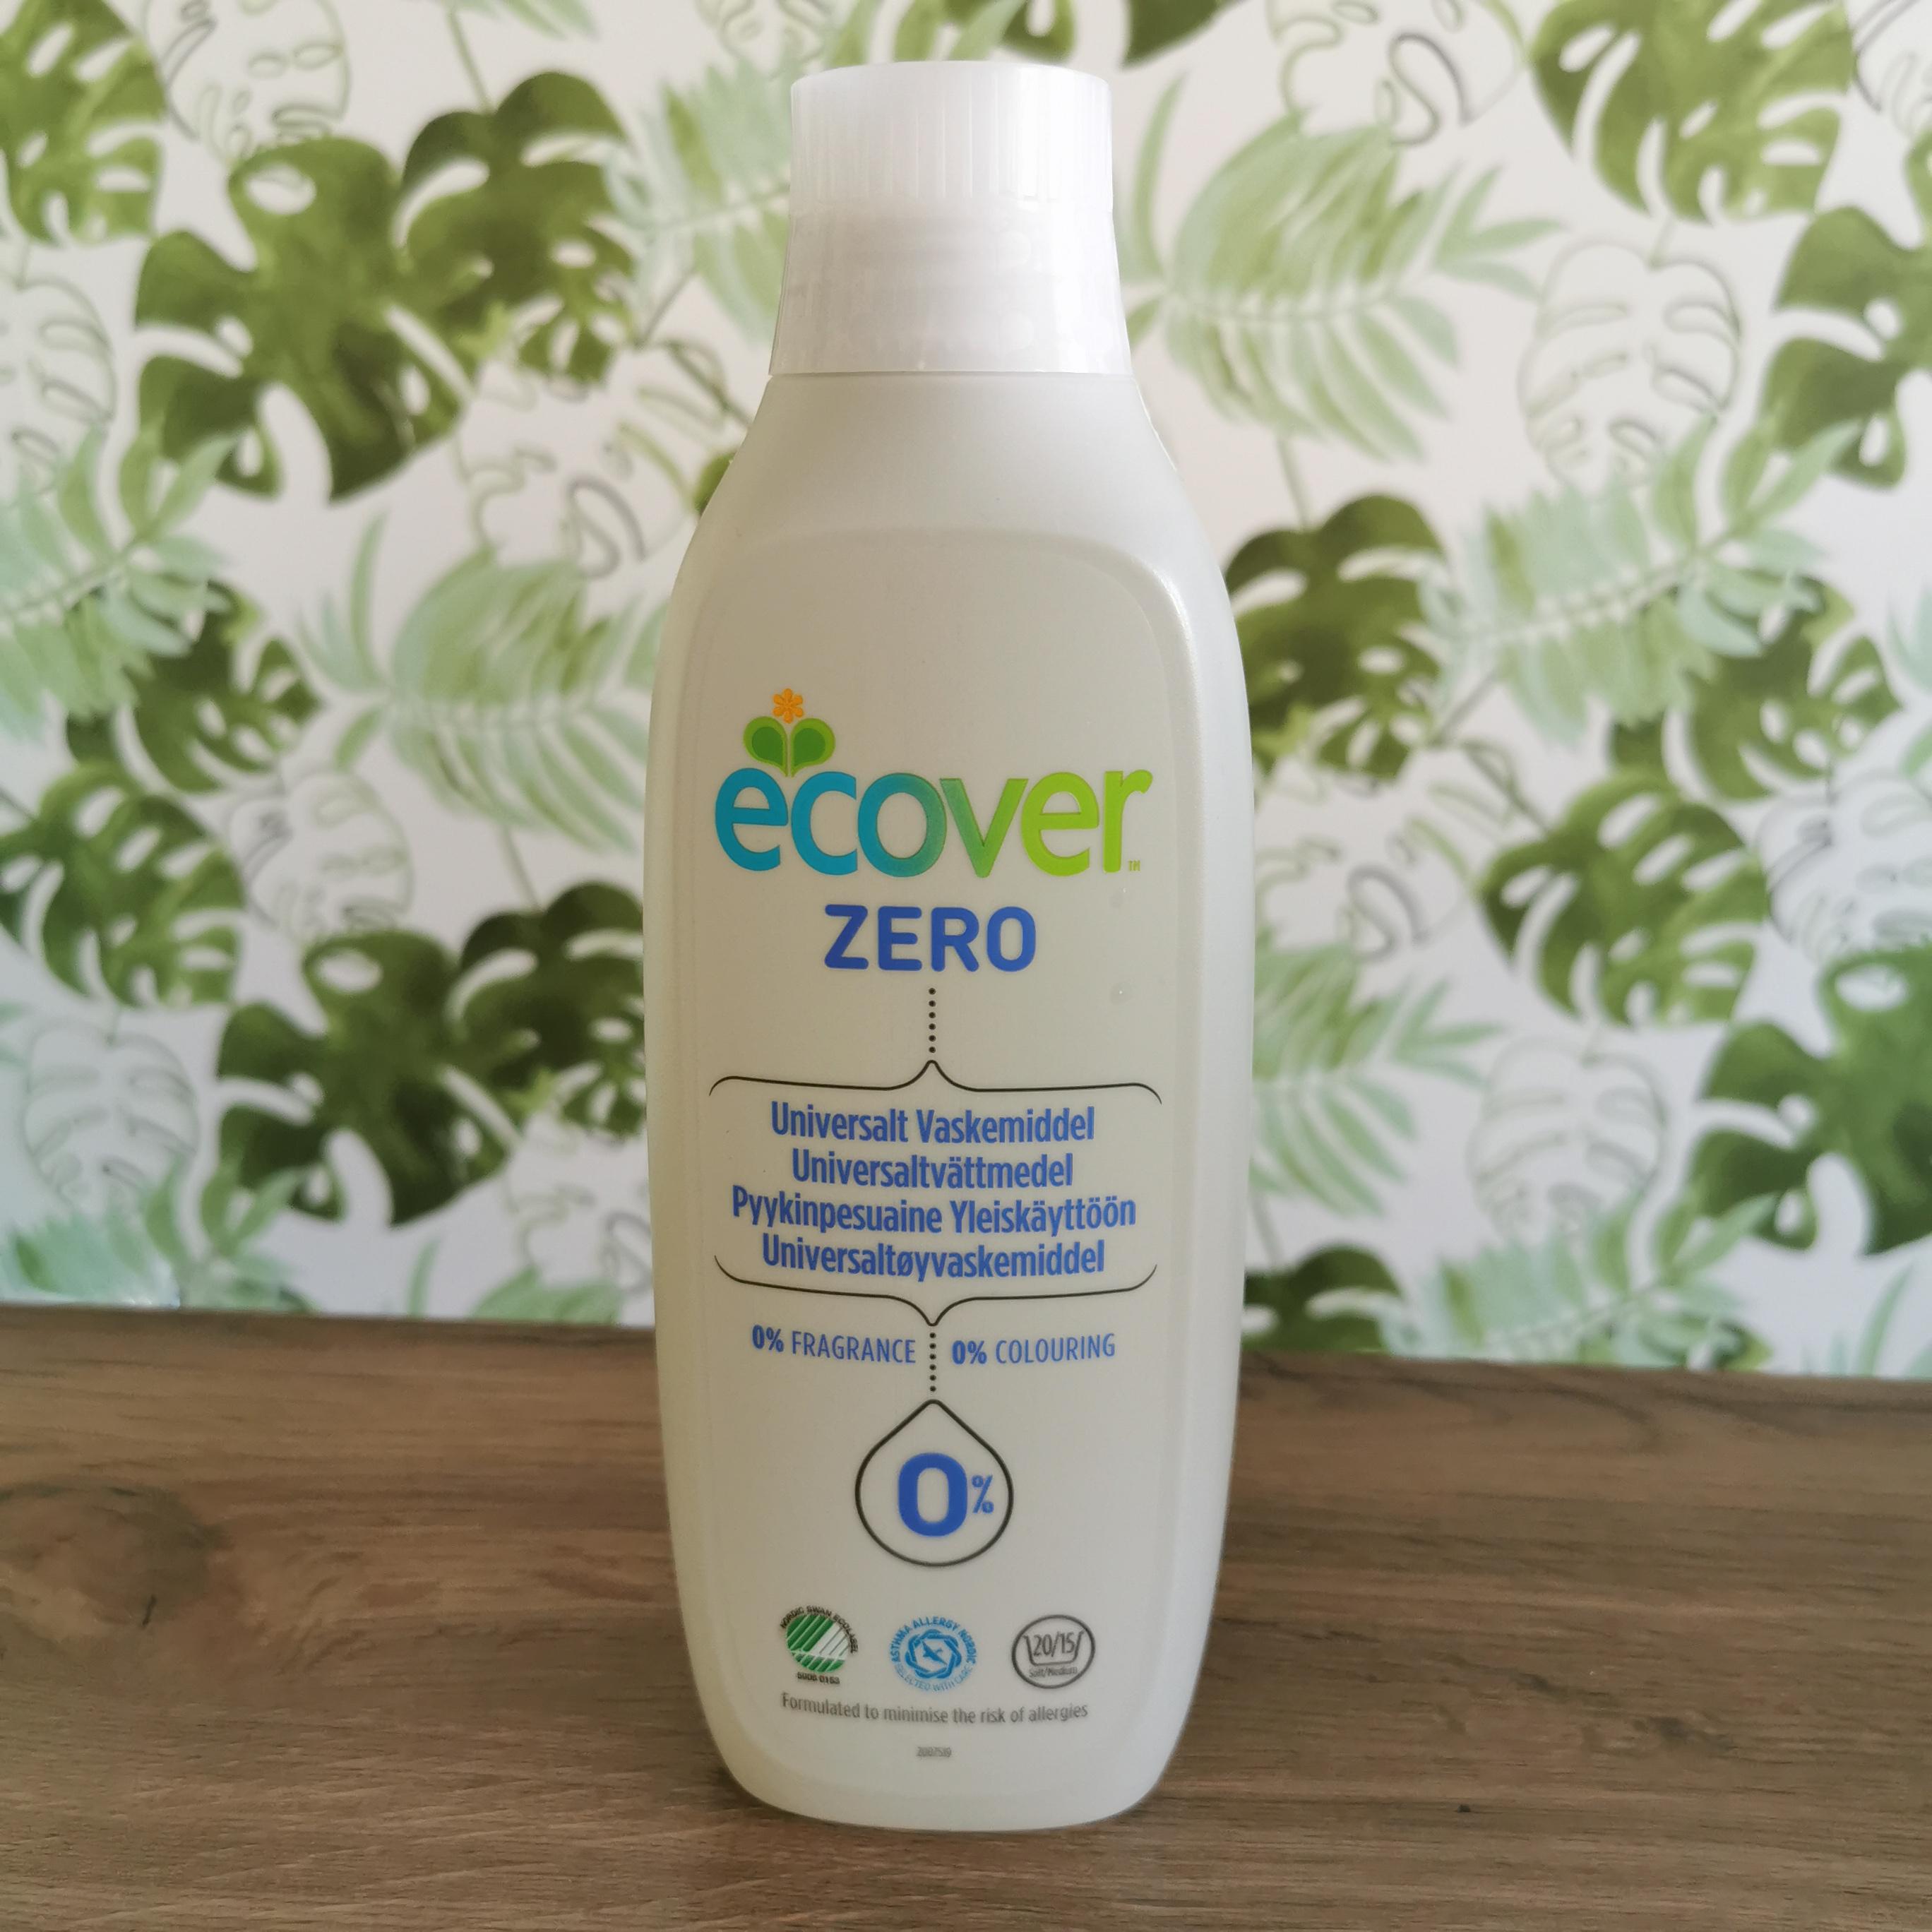 Ecover Zero Tvättmedel